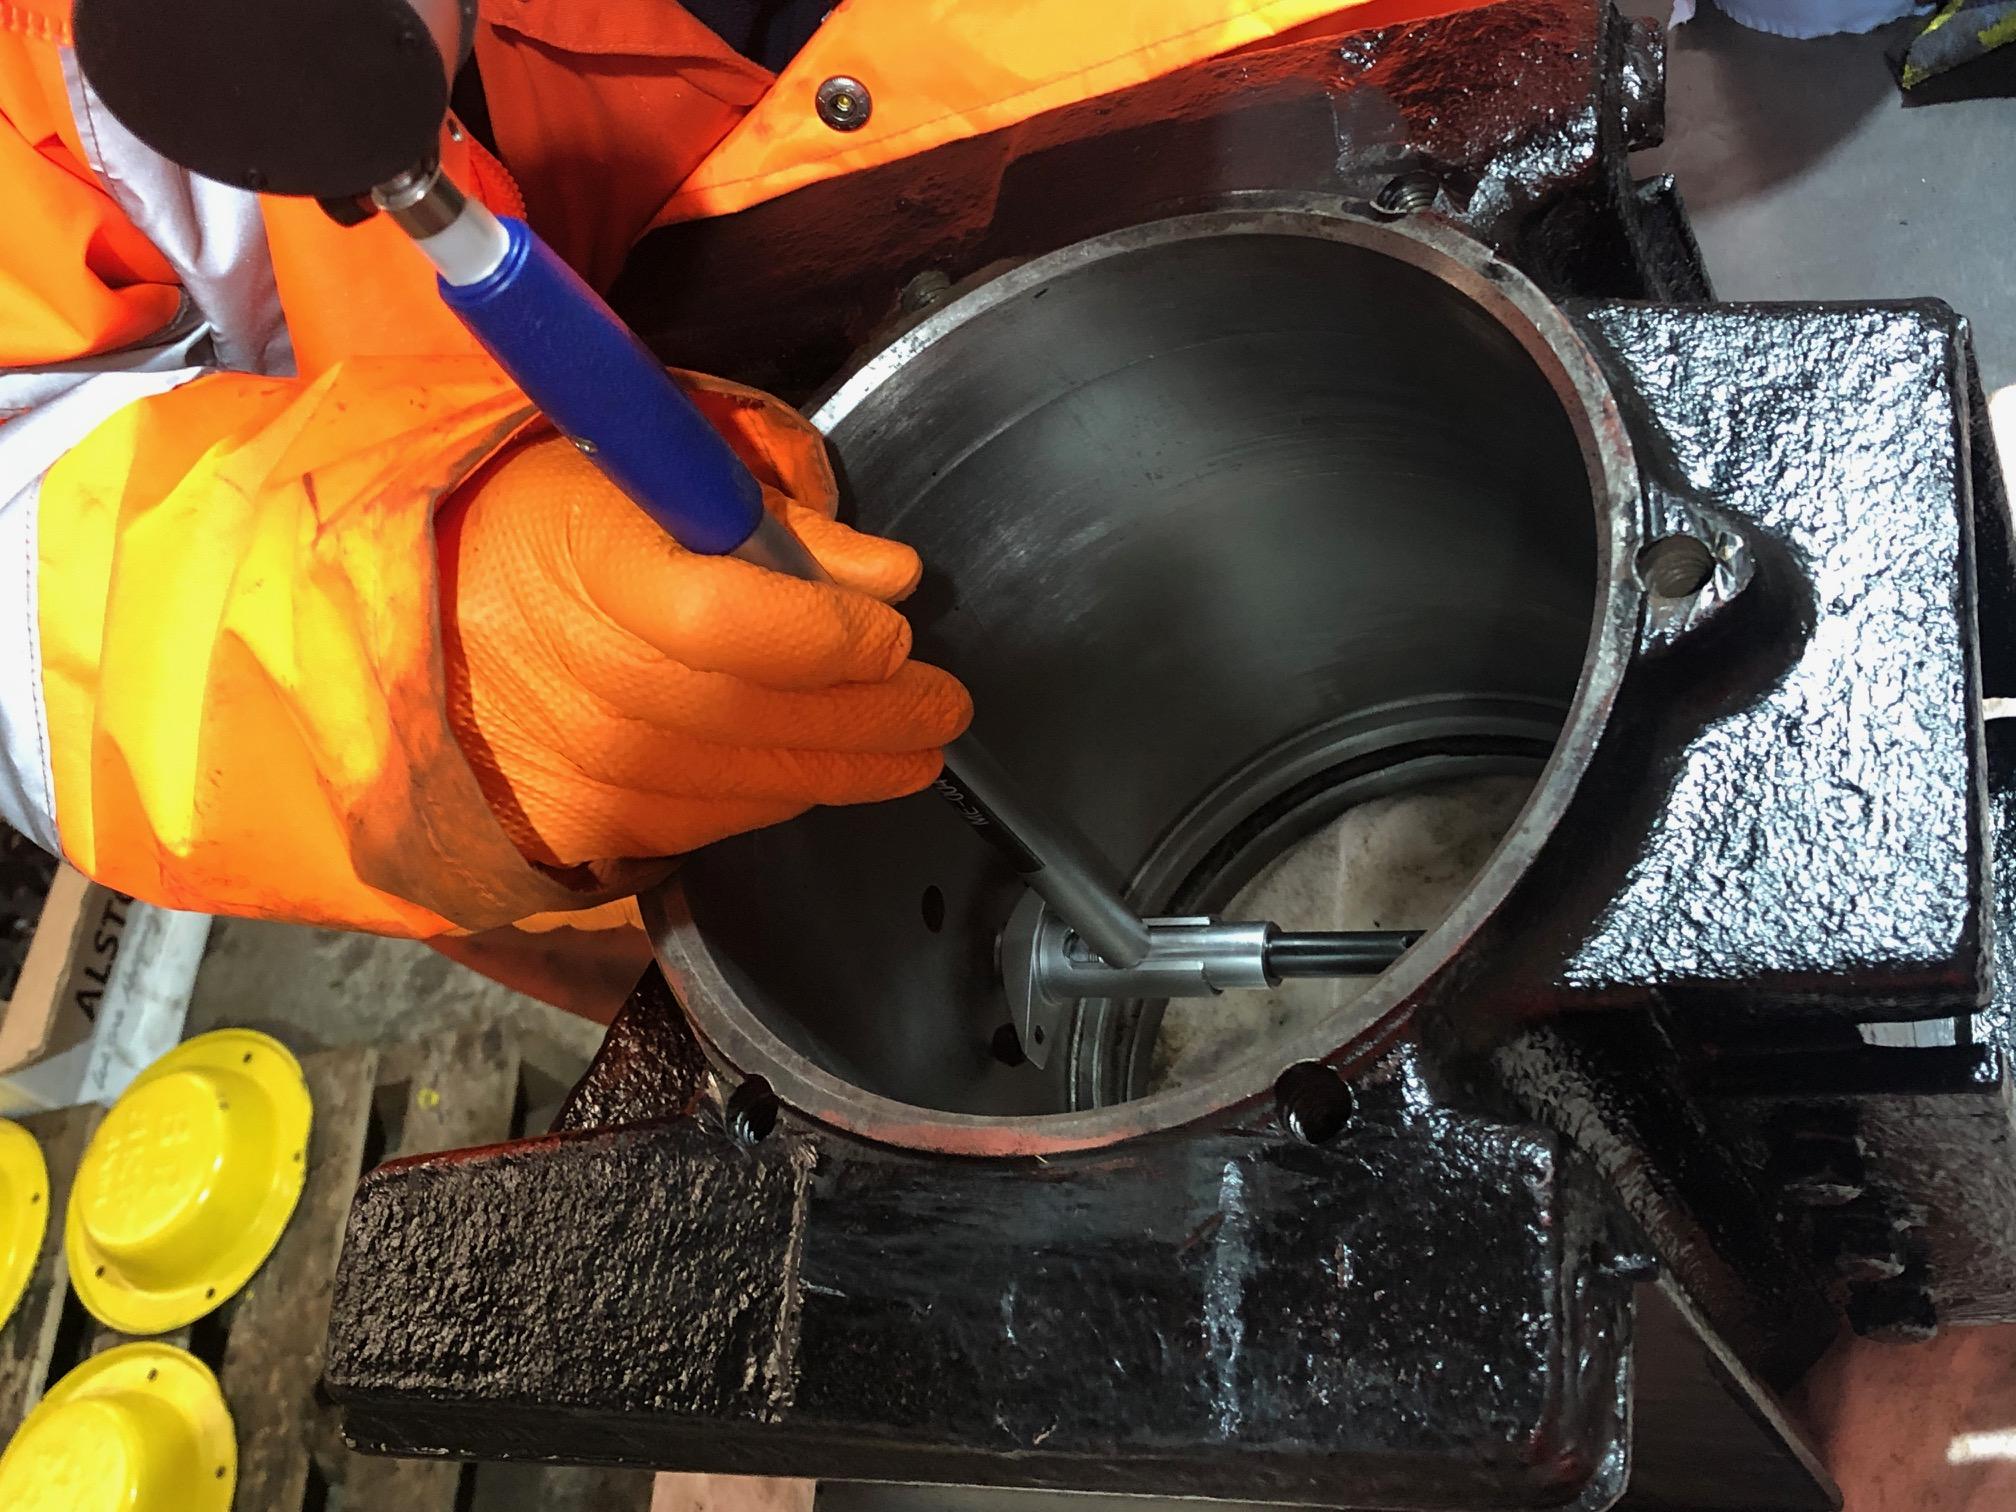 Axlebox Inspection and Overhaul